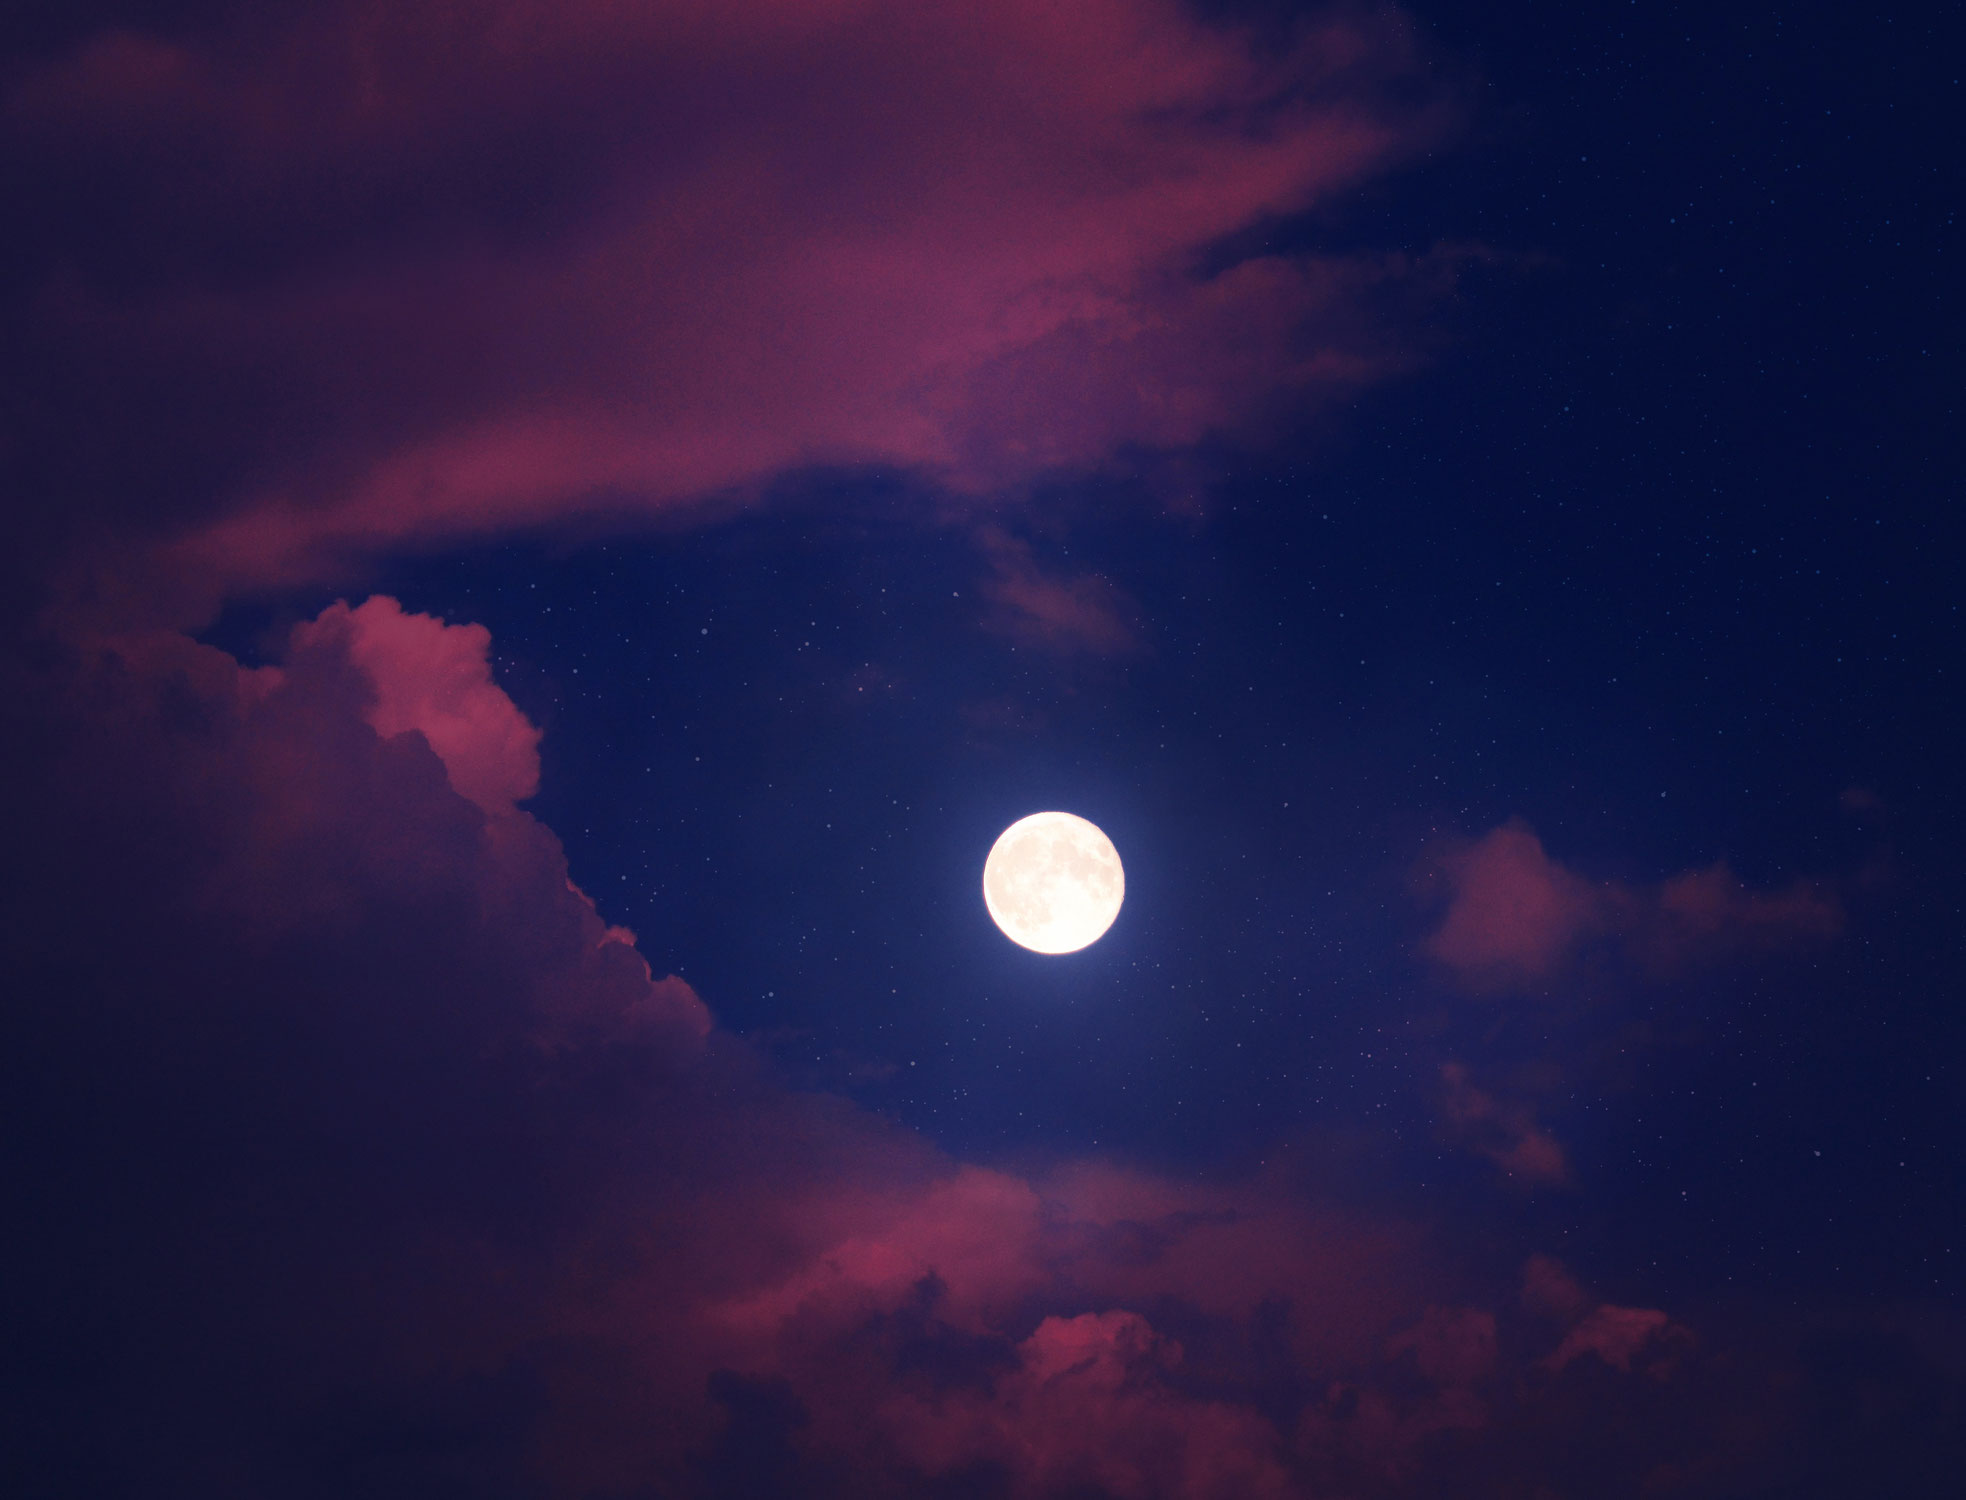 Volle maan 27 april 2021 ♥ Petra Stam ♥ Lichtwerkers Nederland